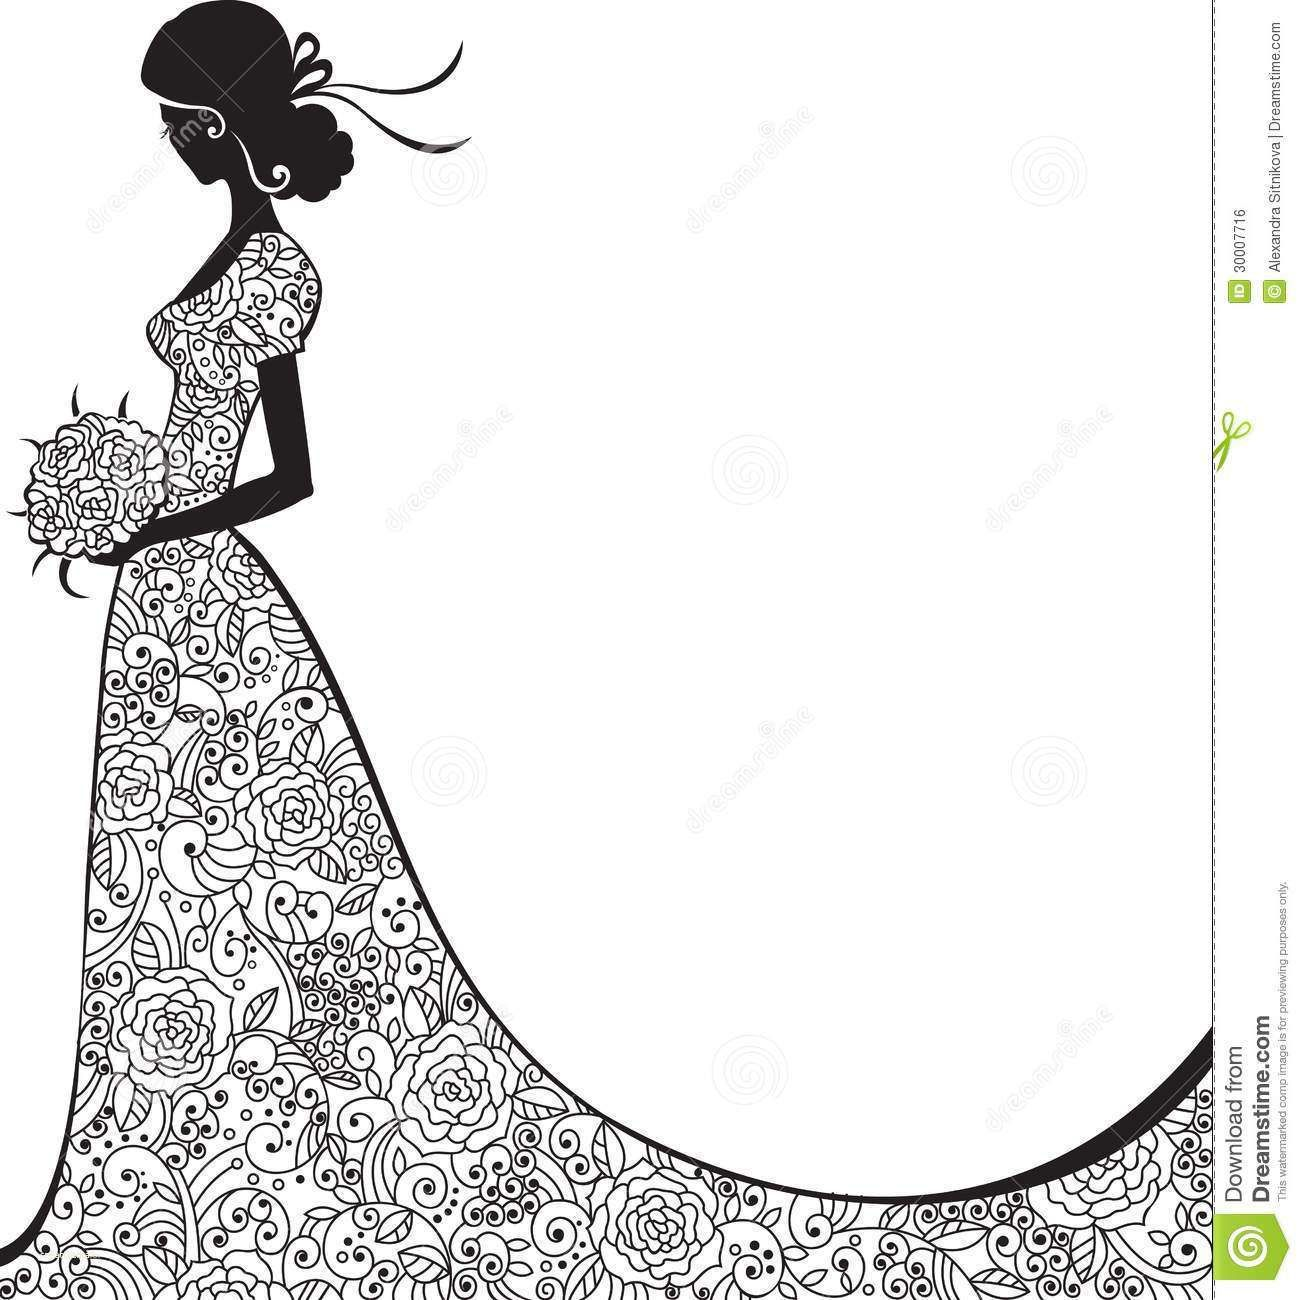 modern wedding clipart awesome modern wedding clipart 13 modern bridal bits baubles hey eep [ 1302 x 1300 Pixel ]